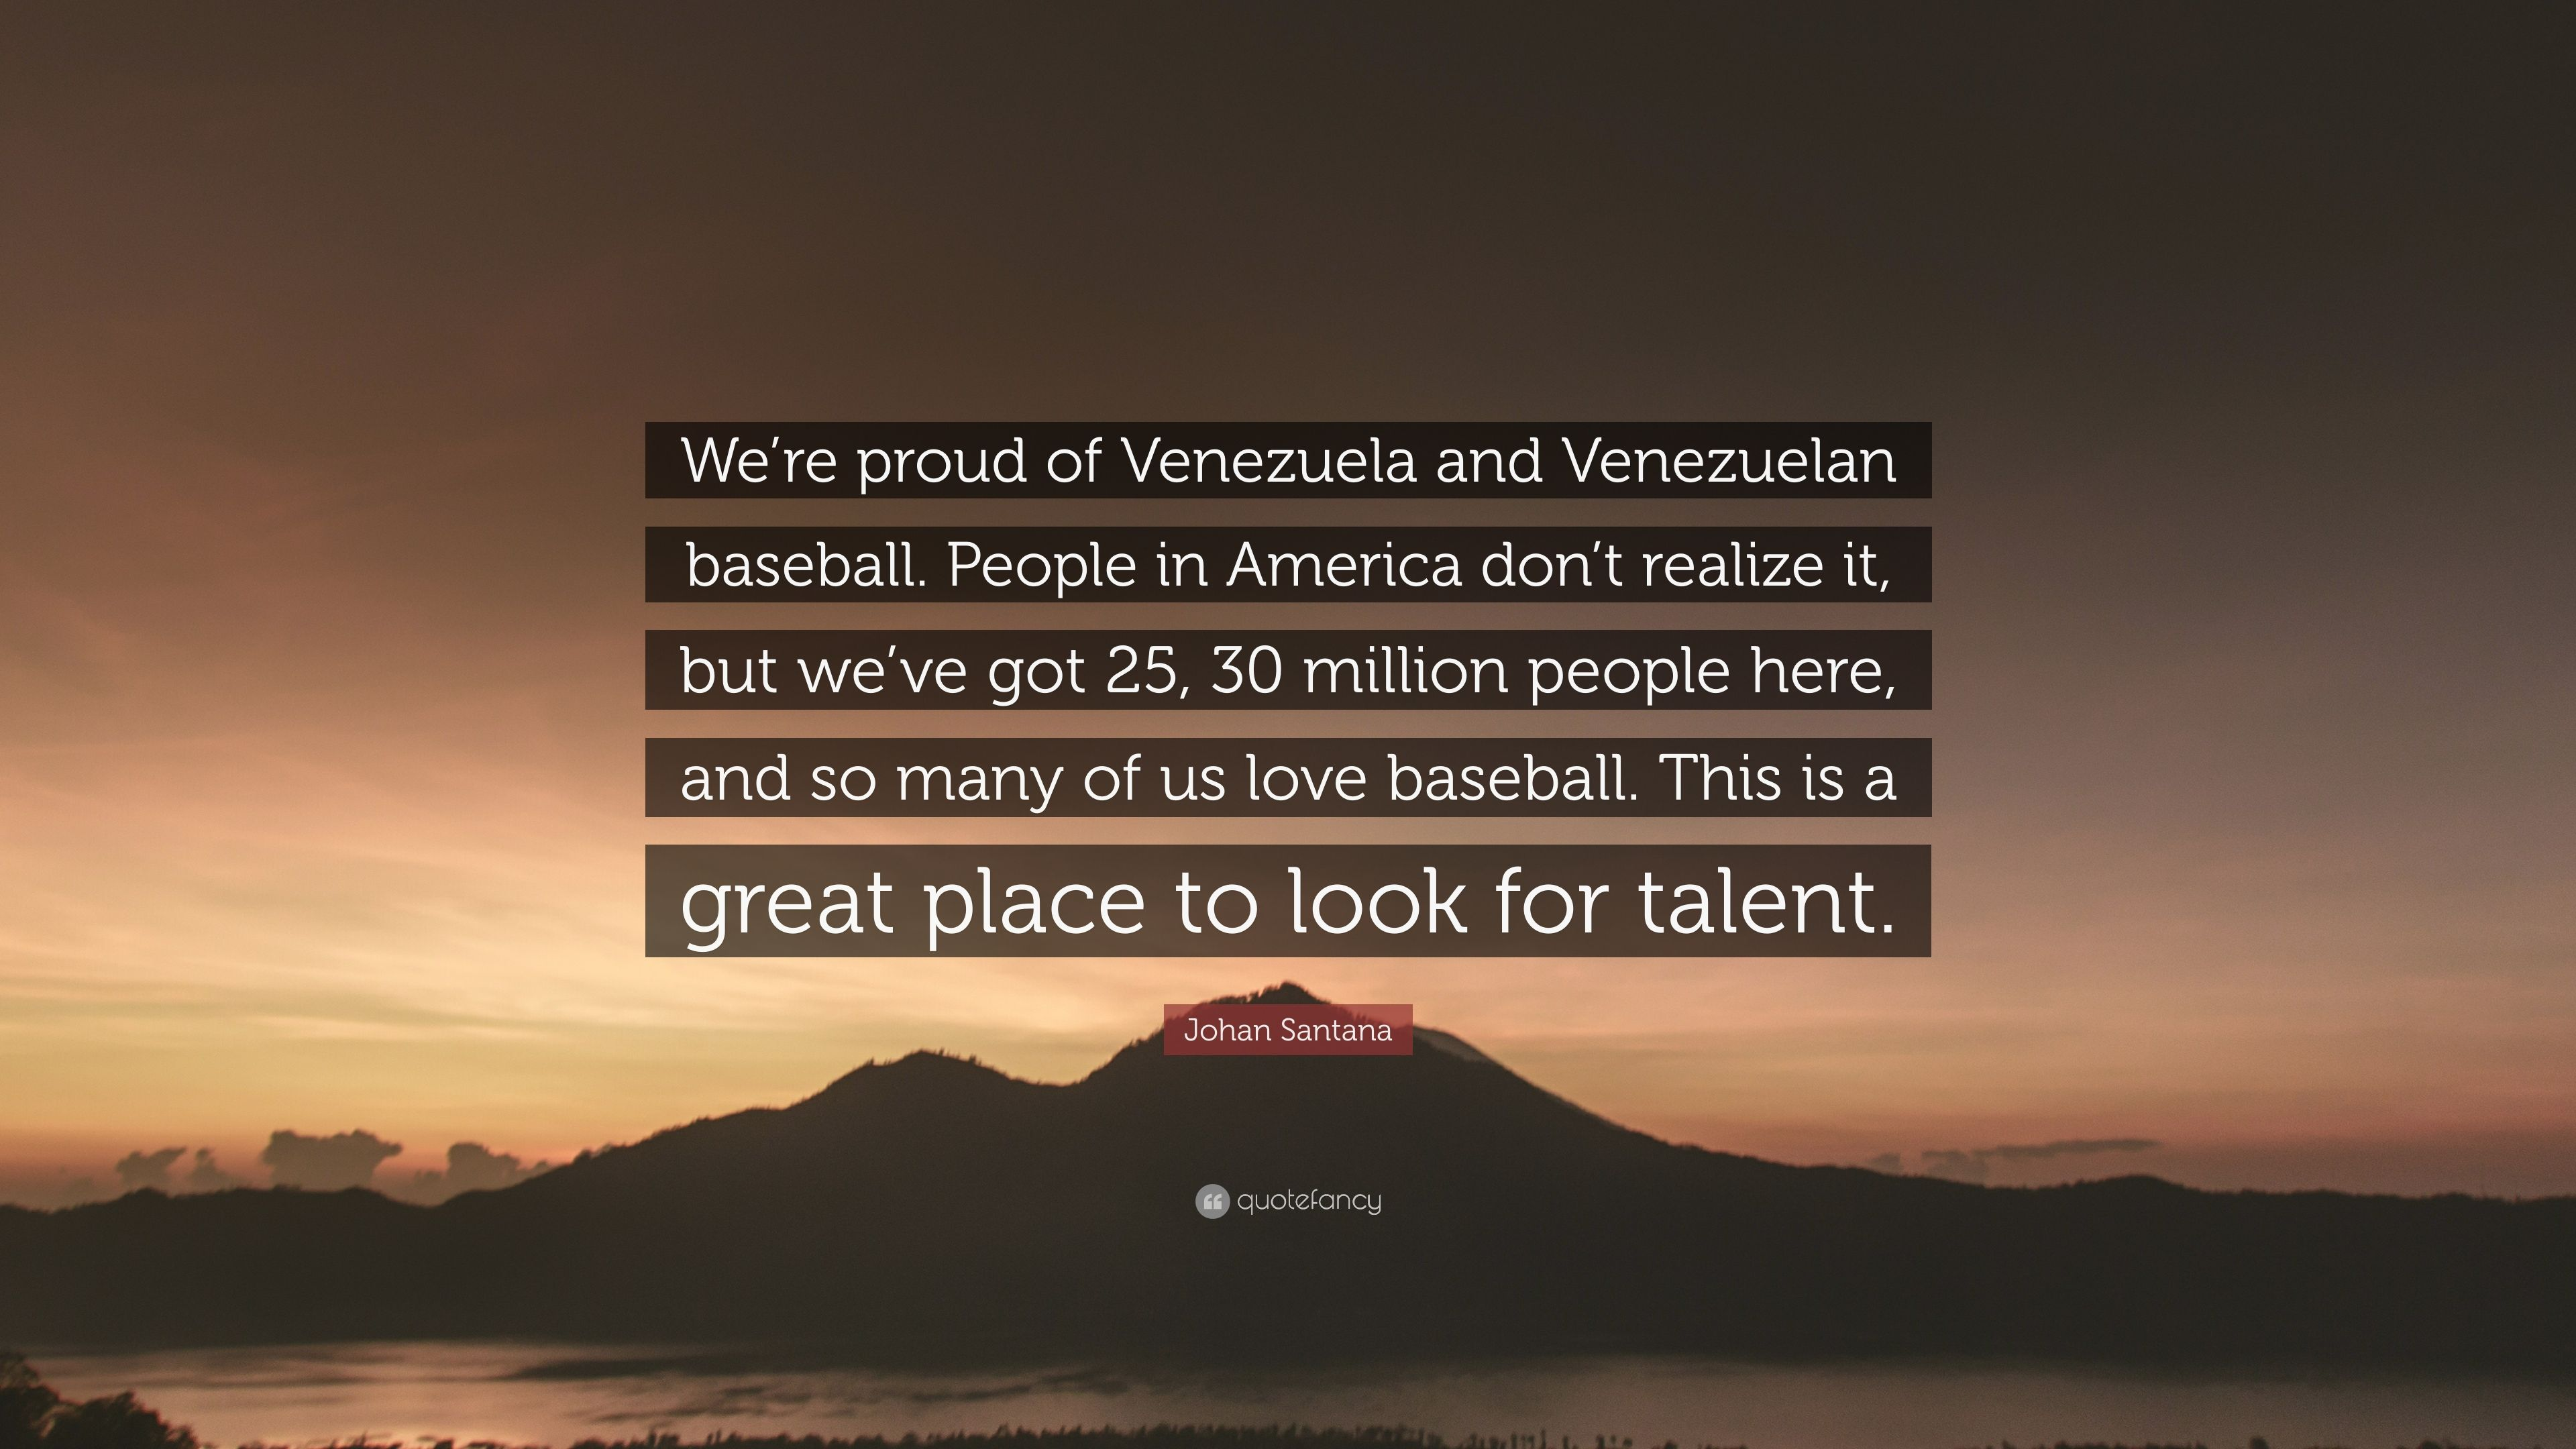 Johan Santana Quote We Re Proud Of Venezuela And Venezuelan Baseball People In America Don T Realize It But We Ve Got 25 30 Million Peopl 7 Wallpapers Quotefancy